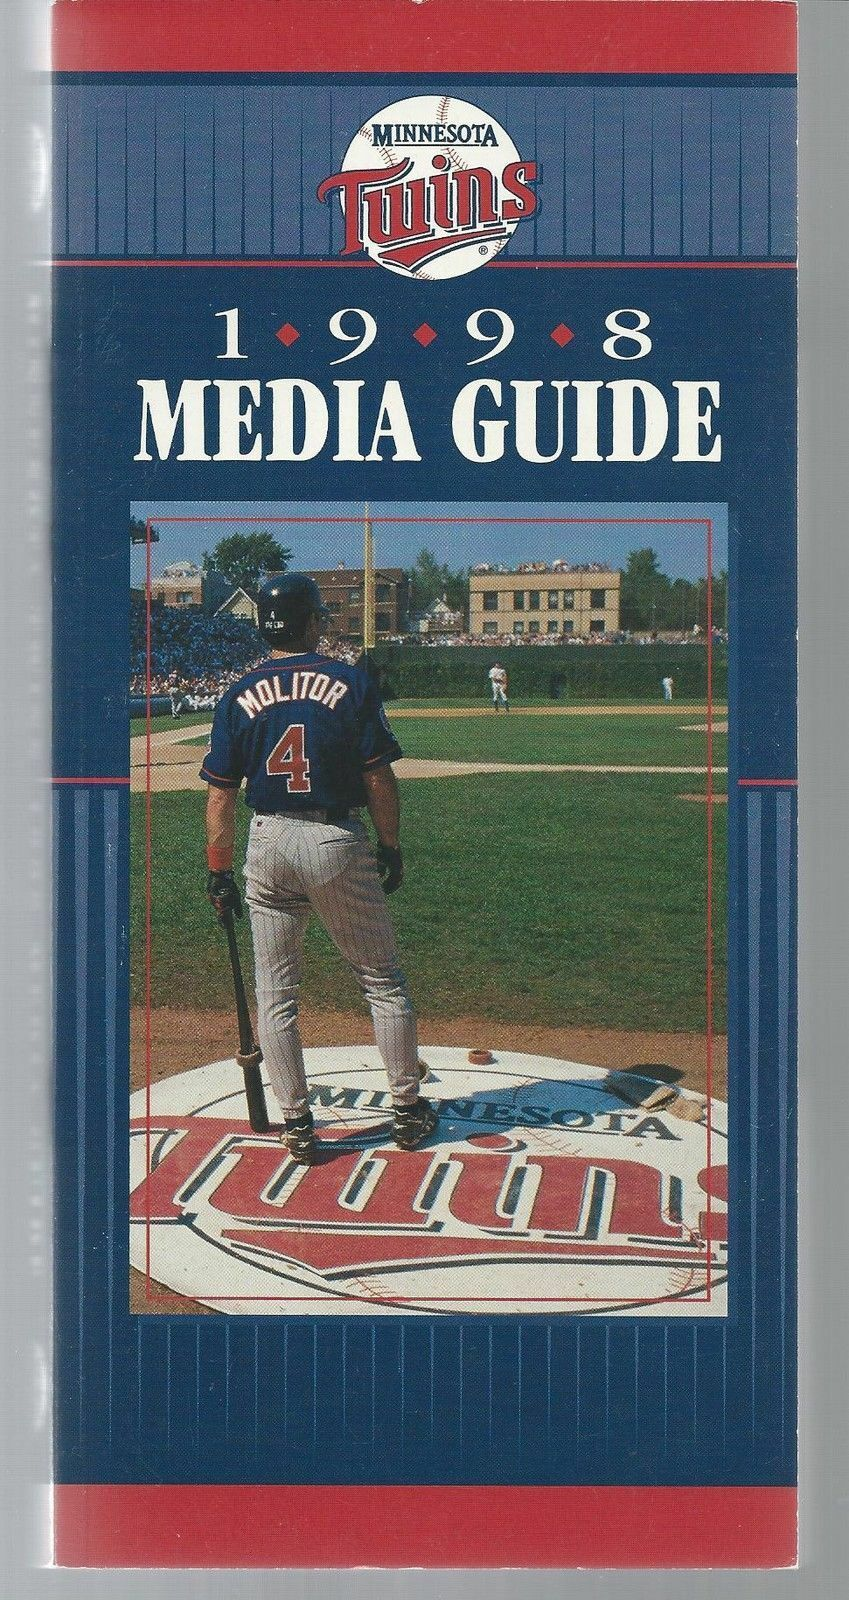 1998 Minnesota Twins Baseball MLB Media Guide - Paul Molitor cover